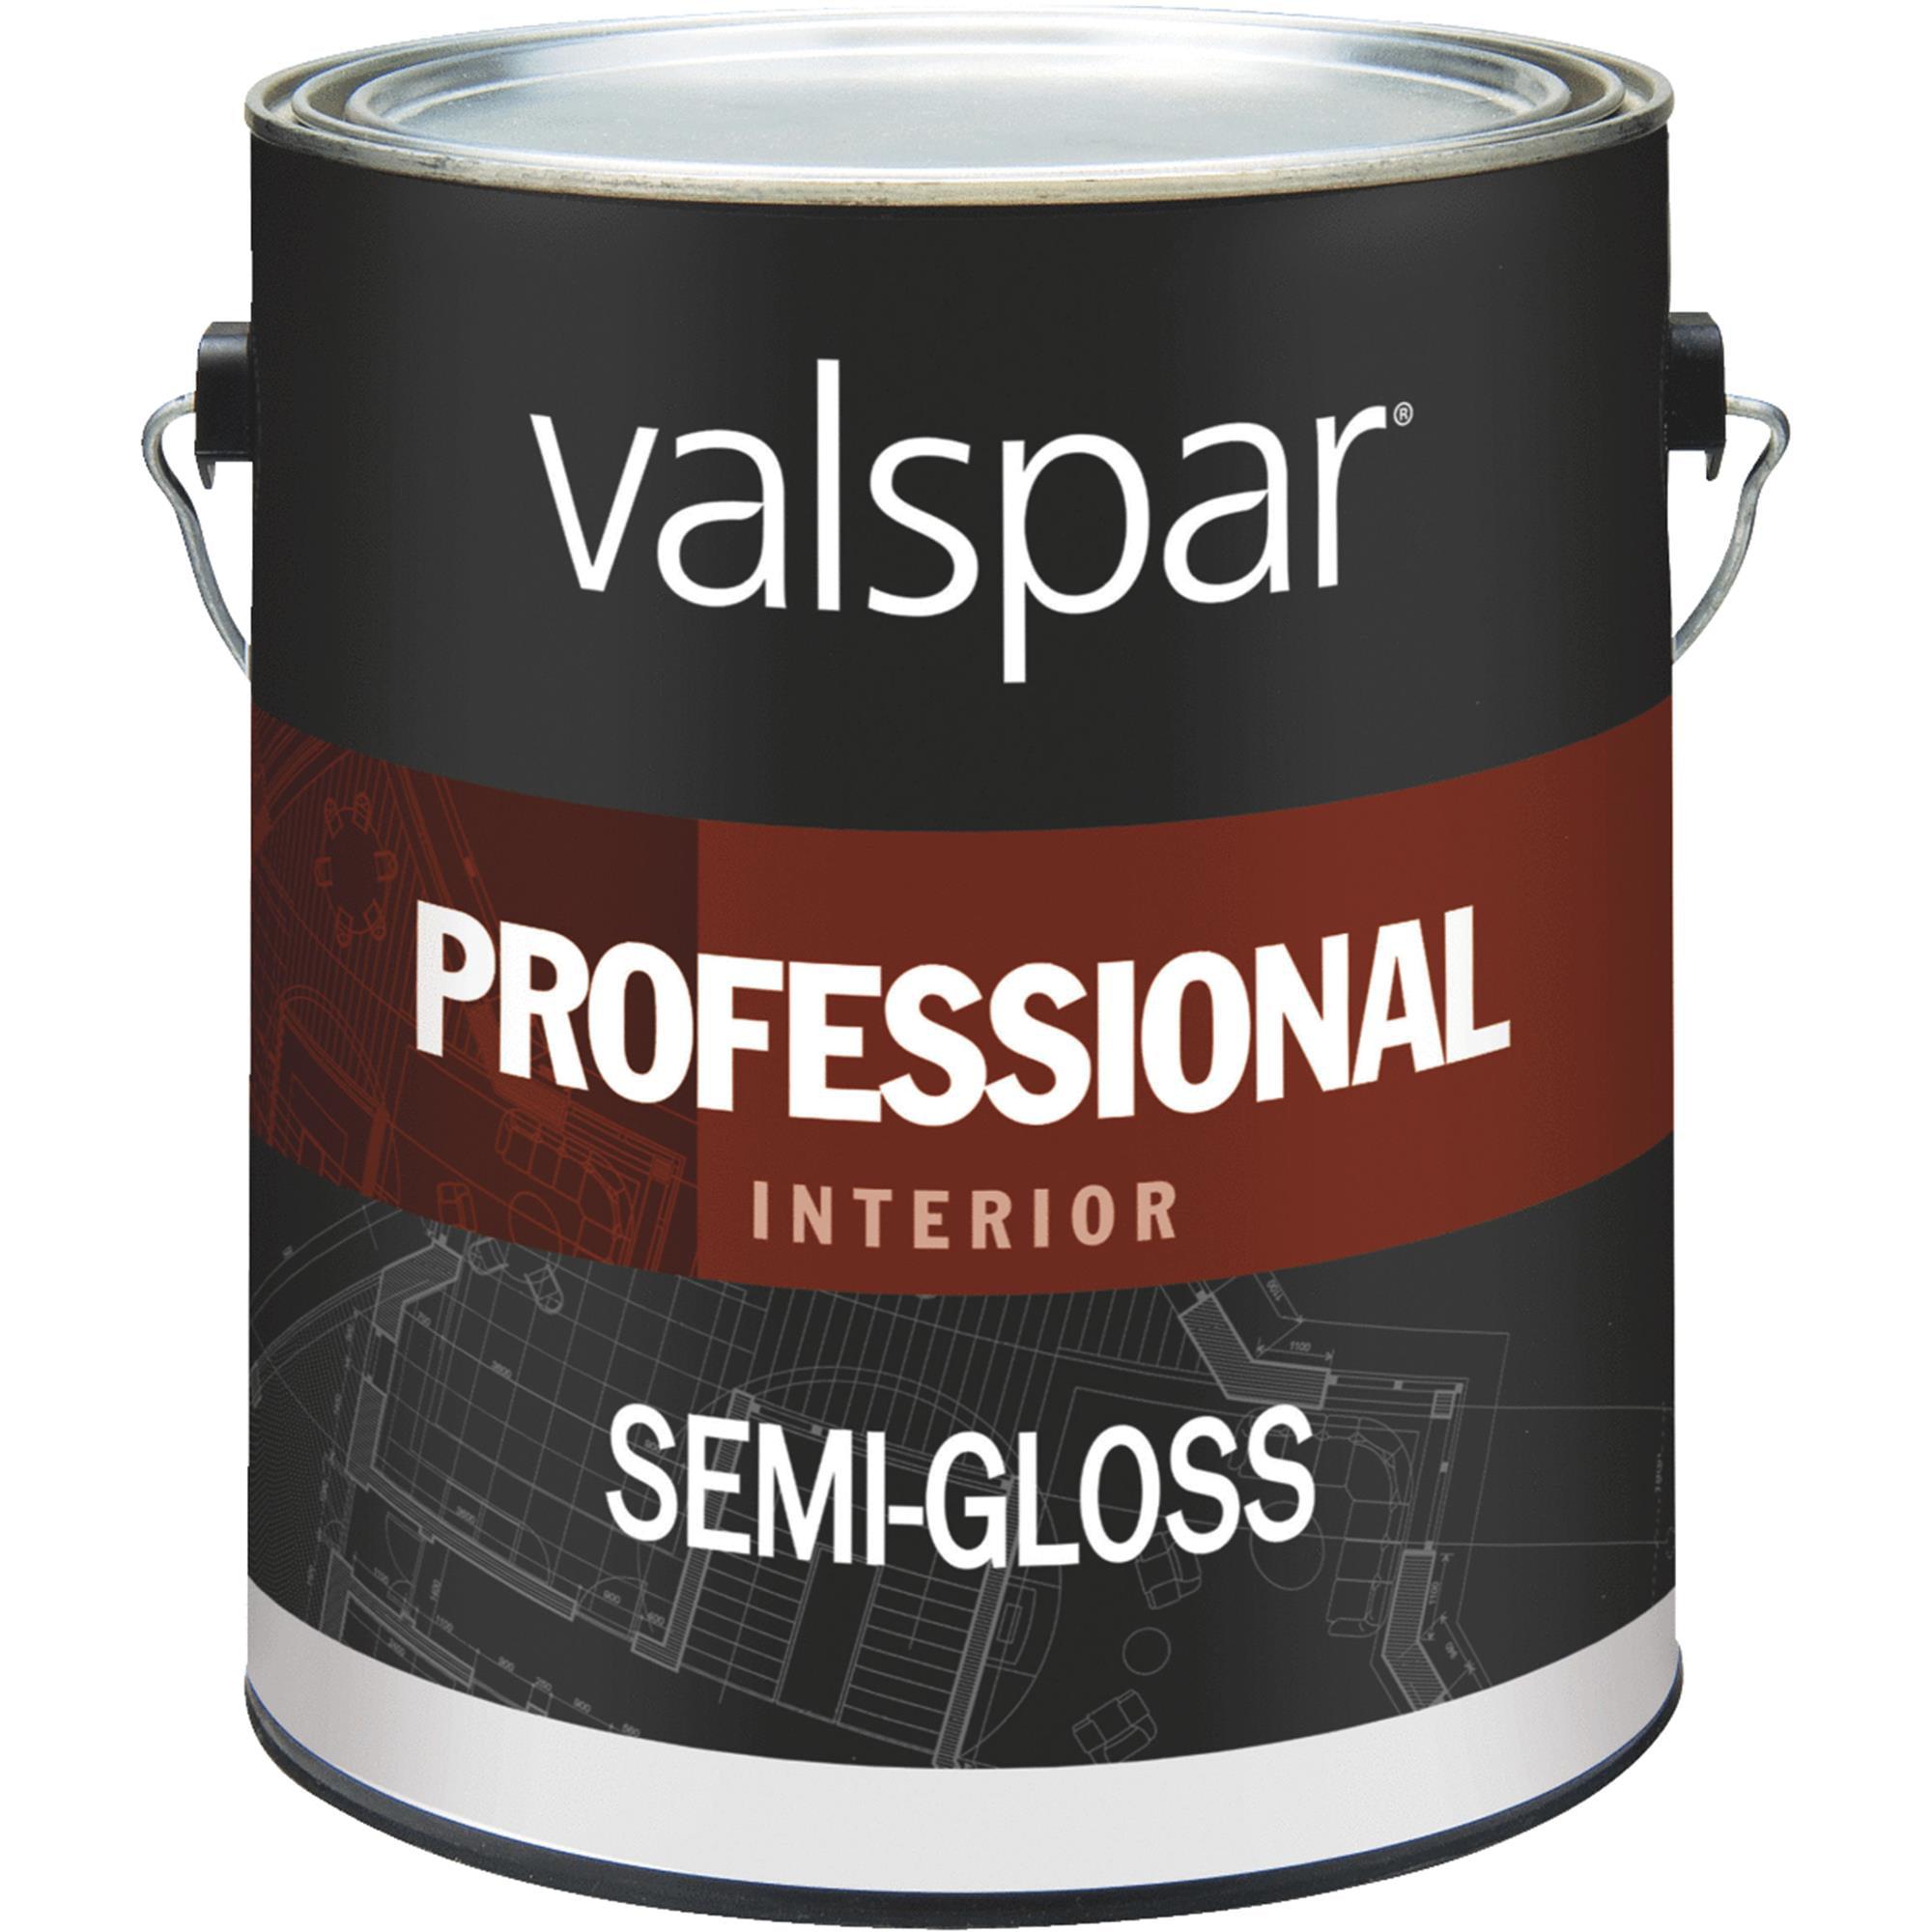 Valspar Professional Latex Semi-Gloss Interior Wall Paint